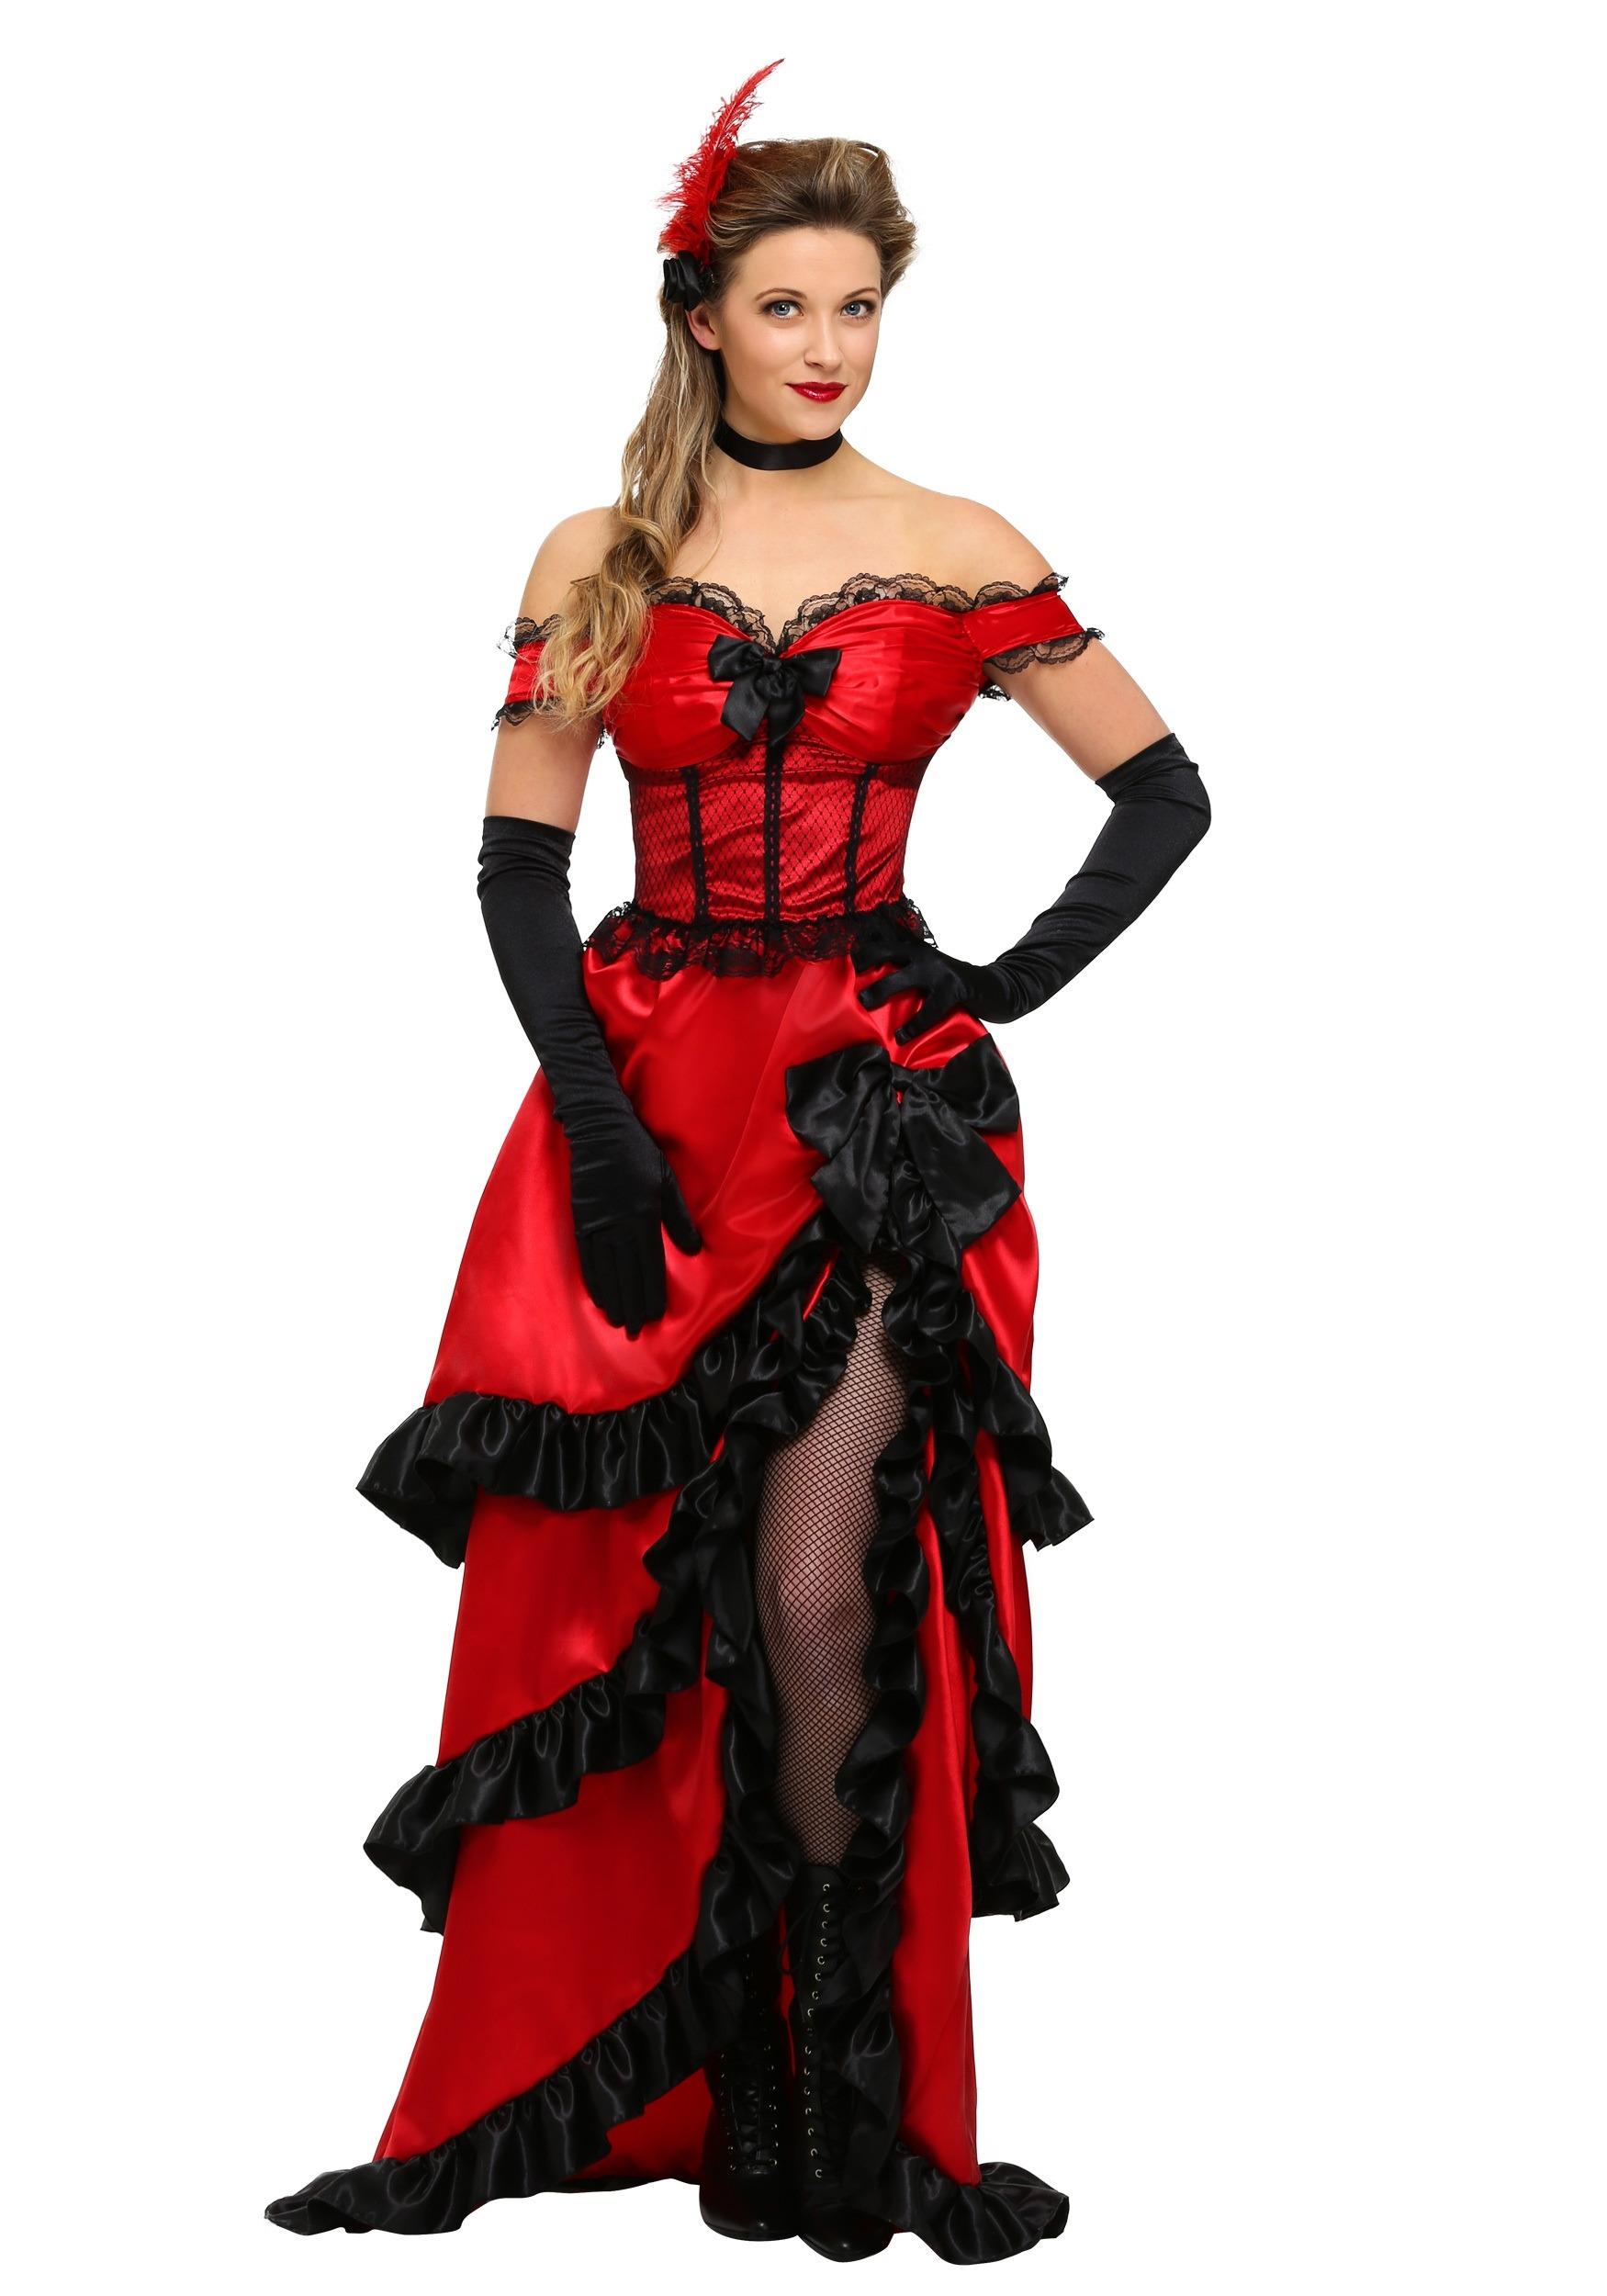 ruff costume